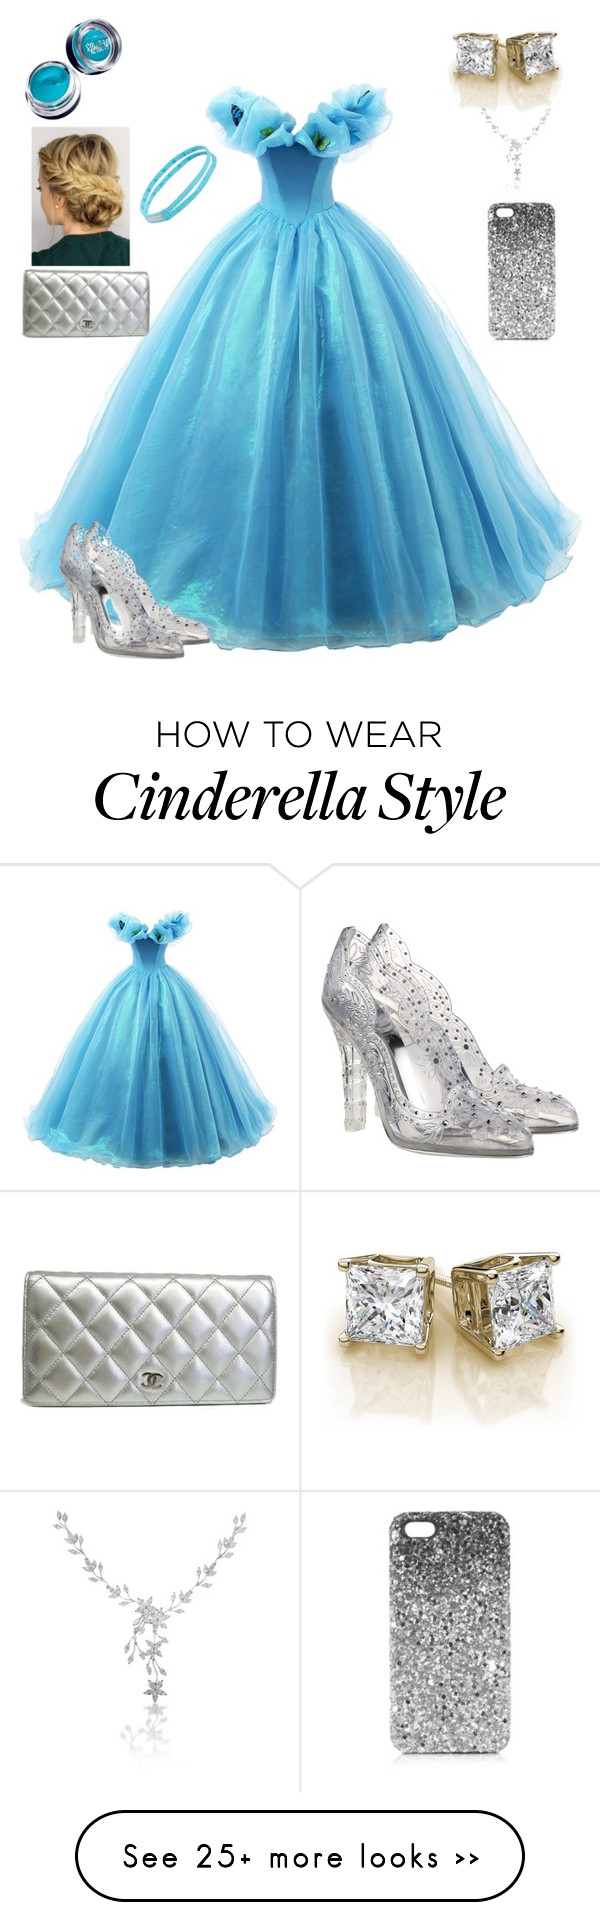 """Cinderella"" by pinksparkleamazing on Polyvore featuring moda, Dolce&Gabbana, Zella, Maybelline, Chanel e Topshop"